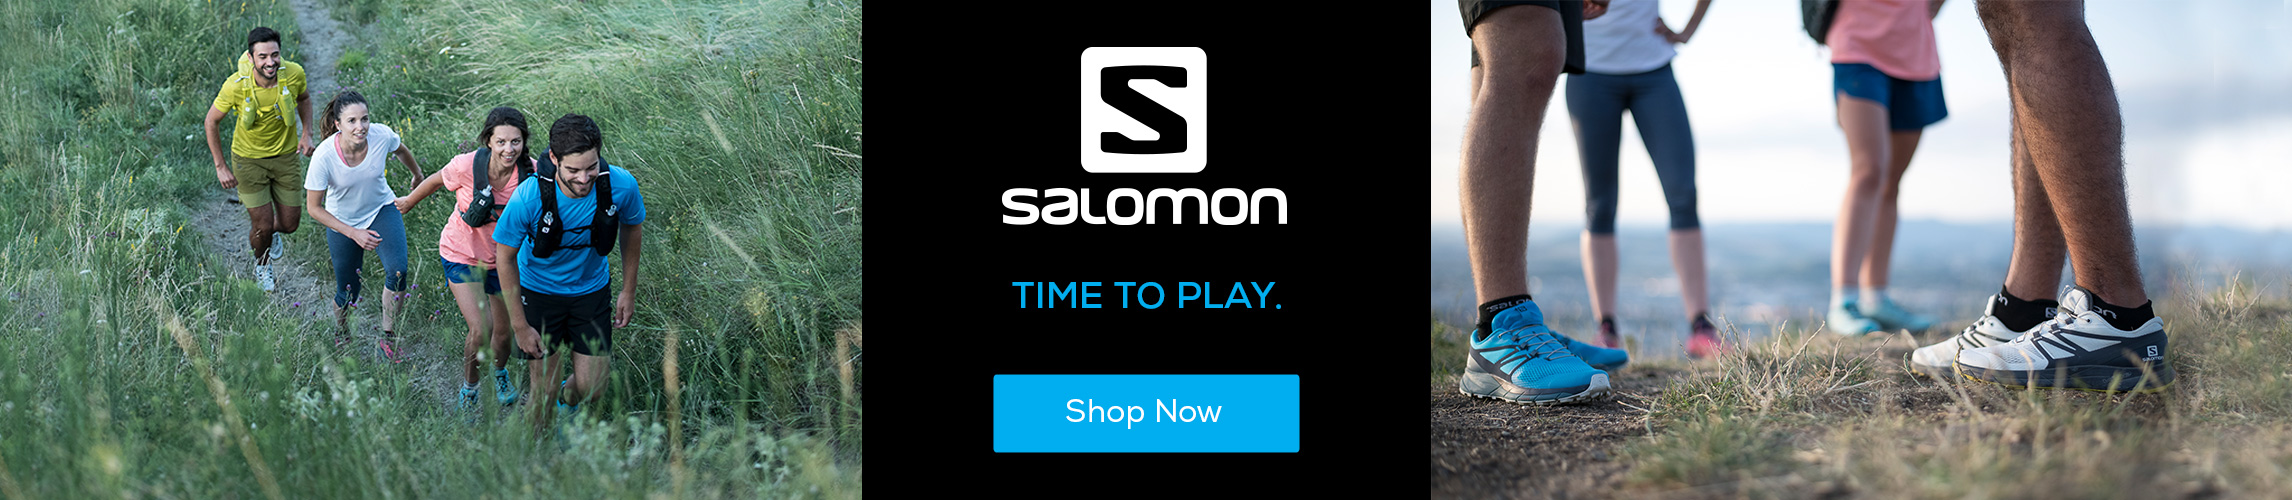 Shop Salomon